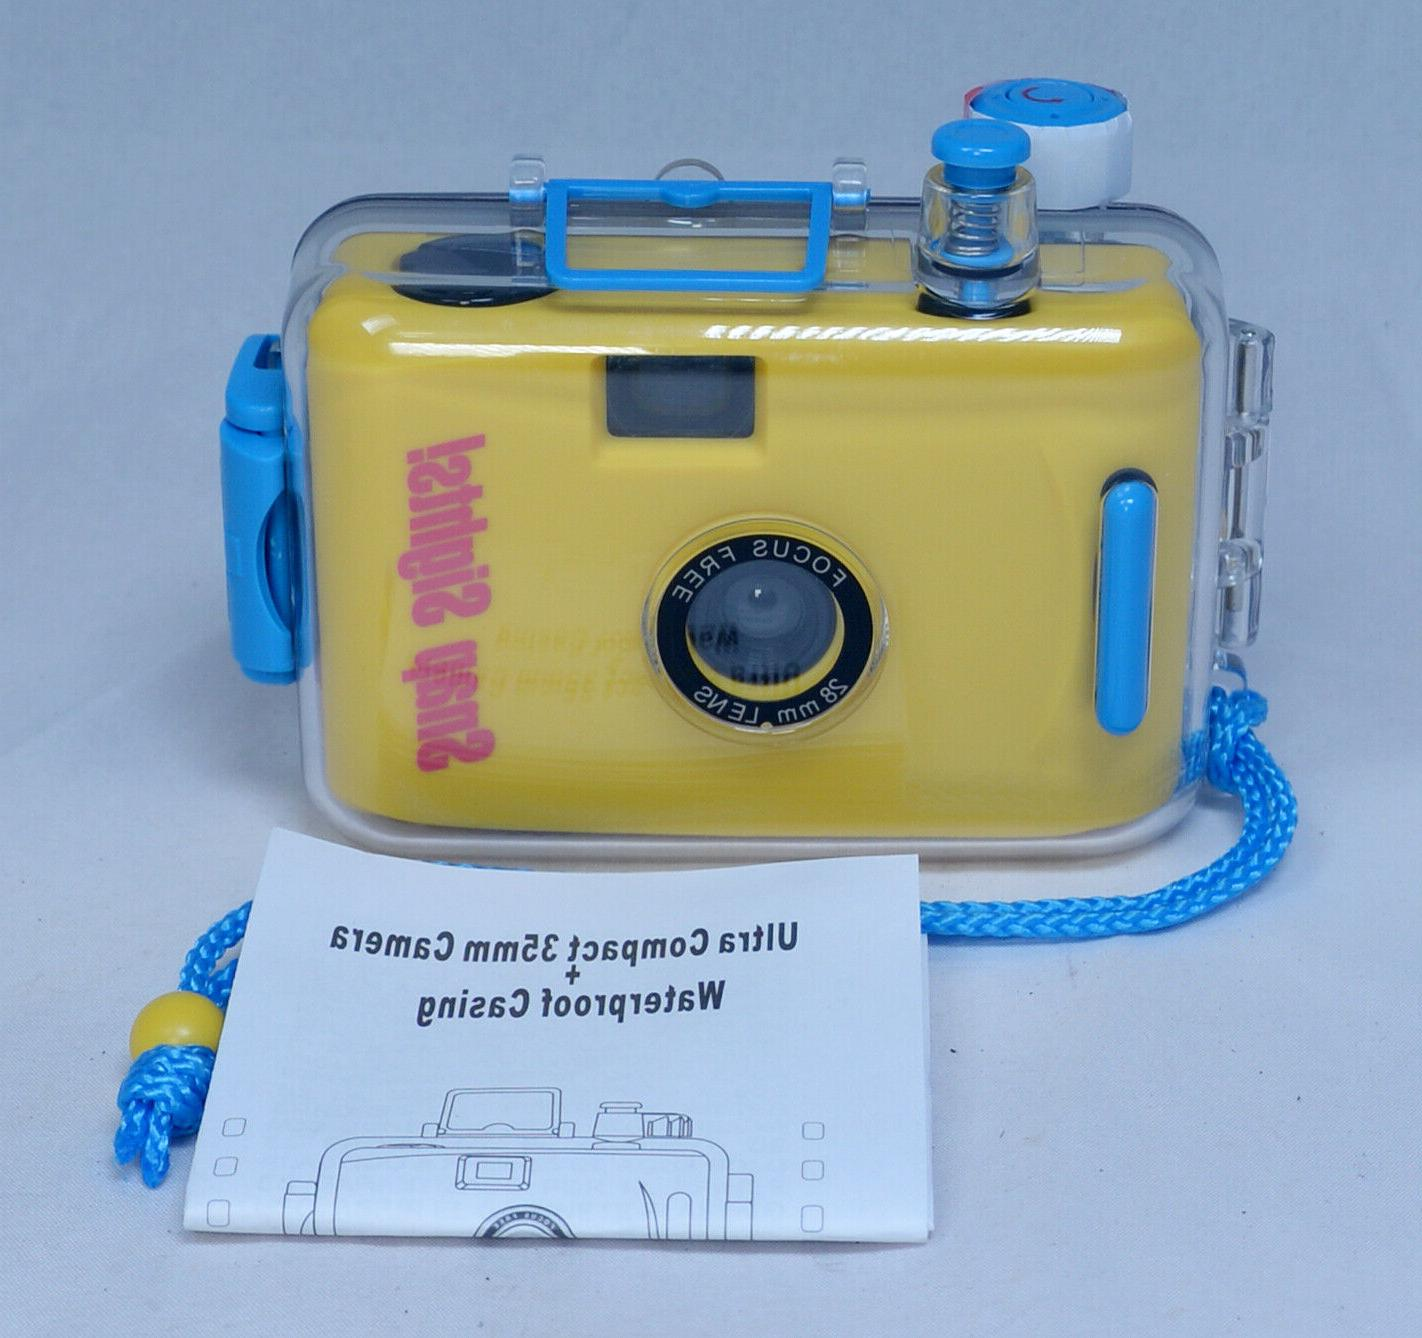 SNAP SIGHTS 35mm Film Casing Focus Free